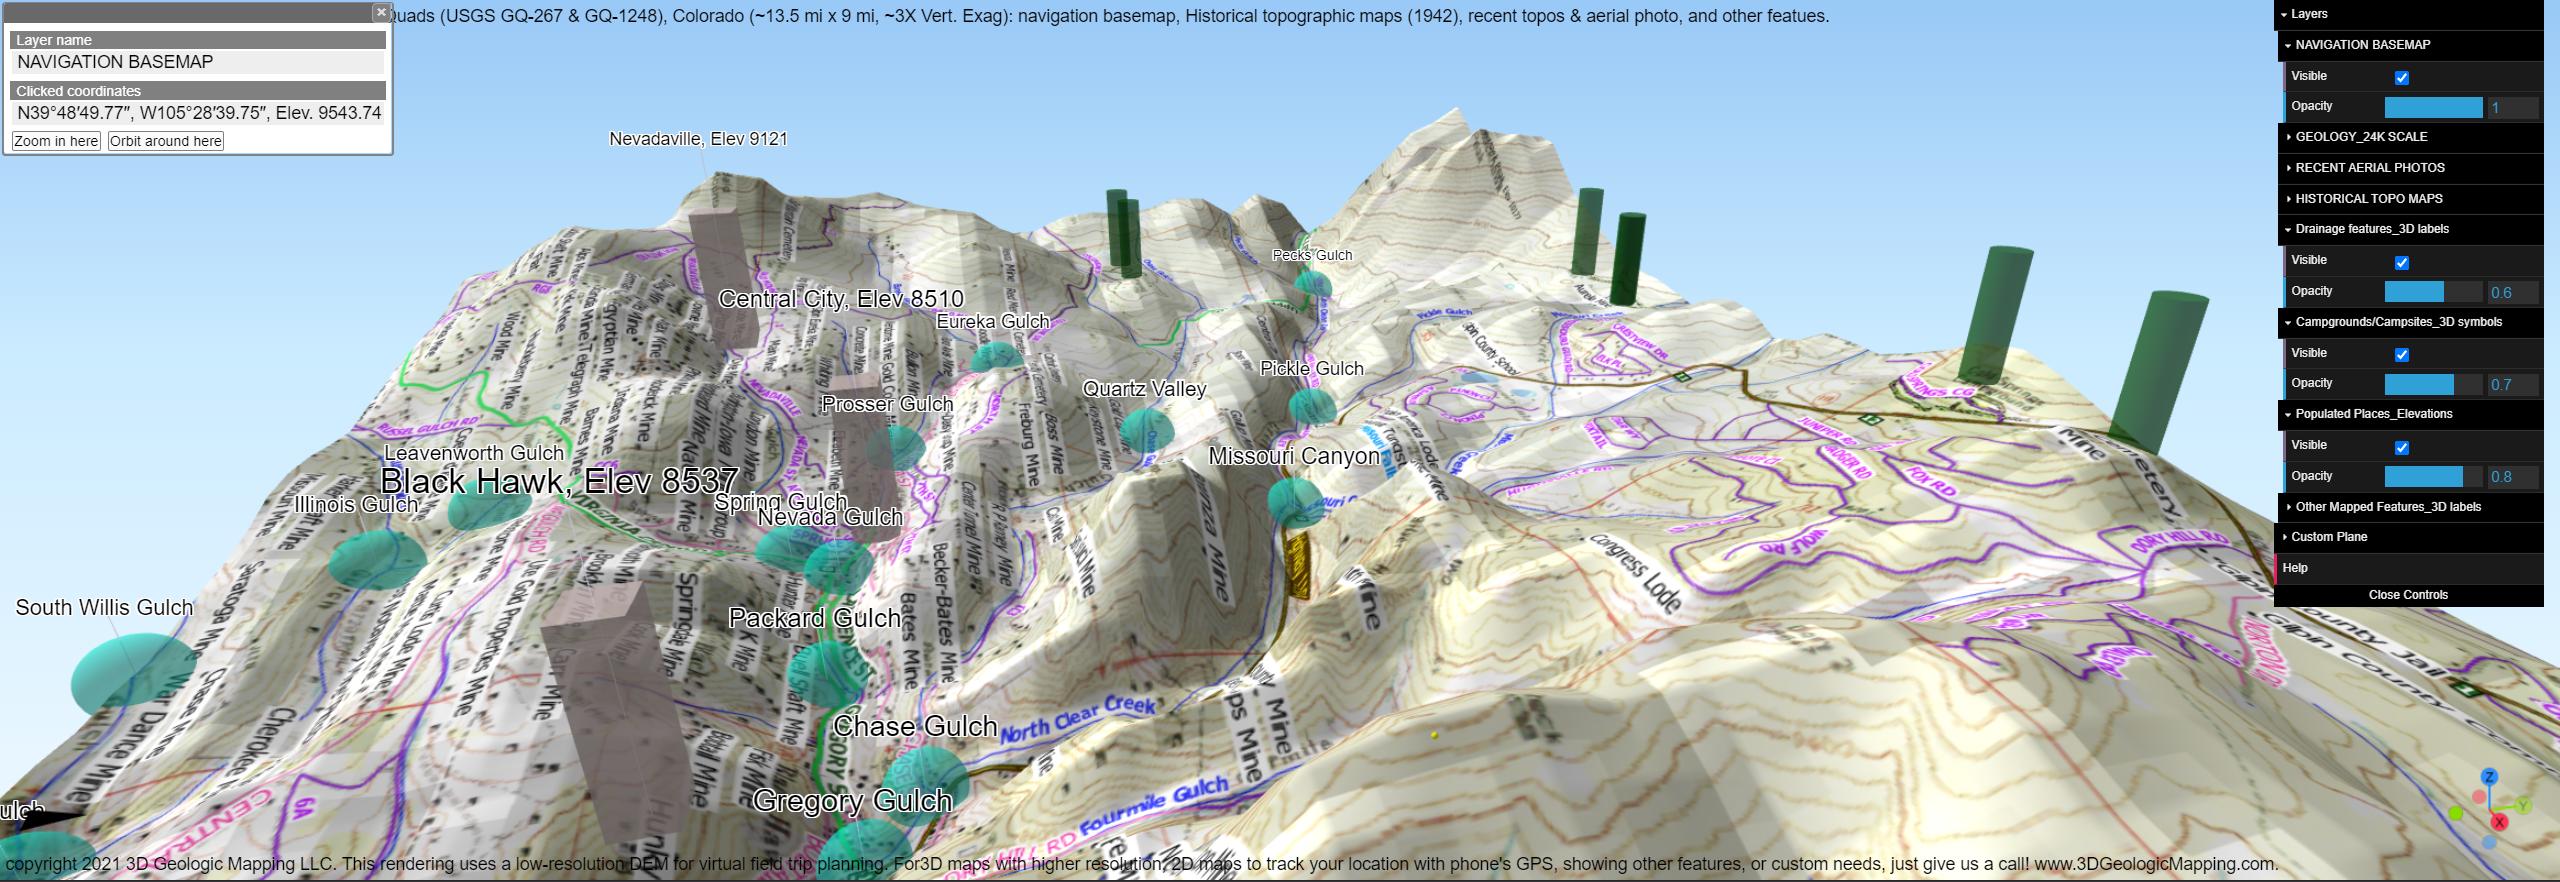 Interactive 3D map with 3D symbols